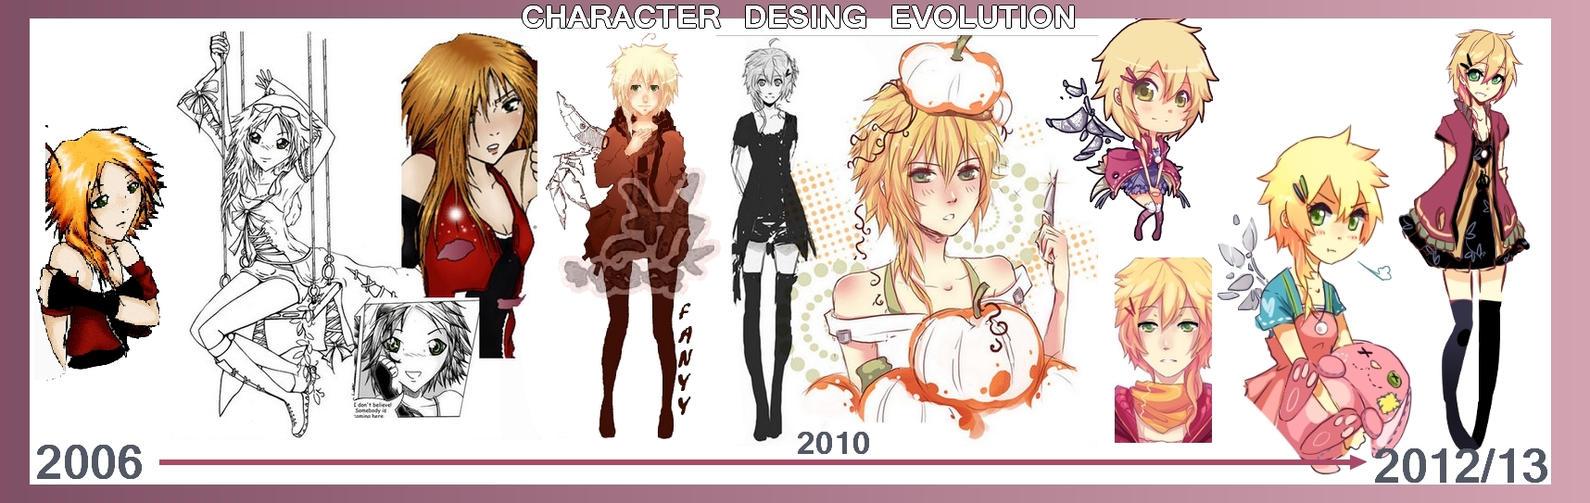 Character Design Evolution : Character design evolution by quiss on deviantart